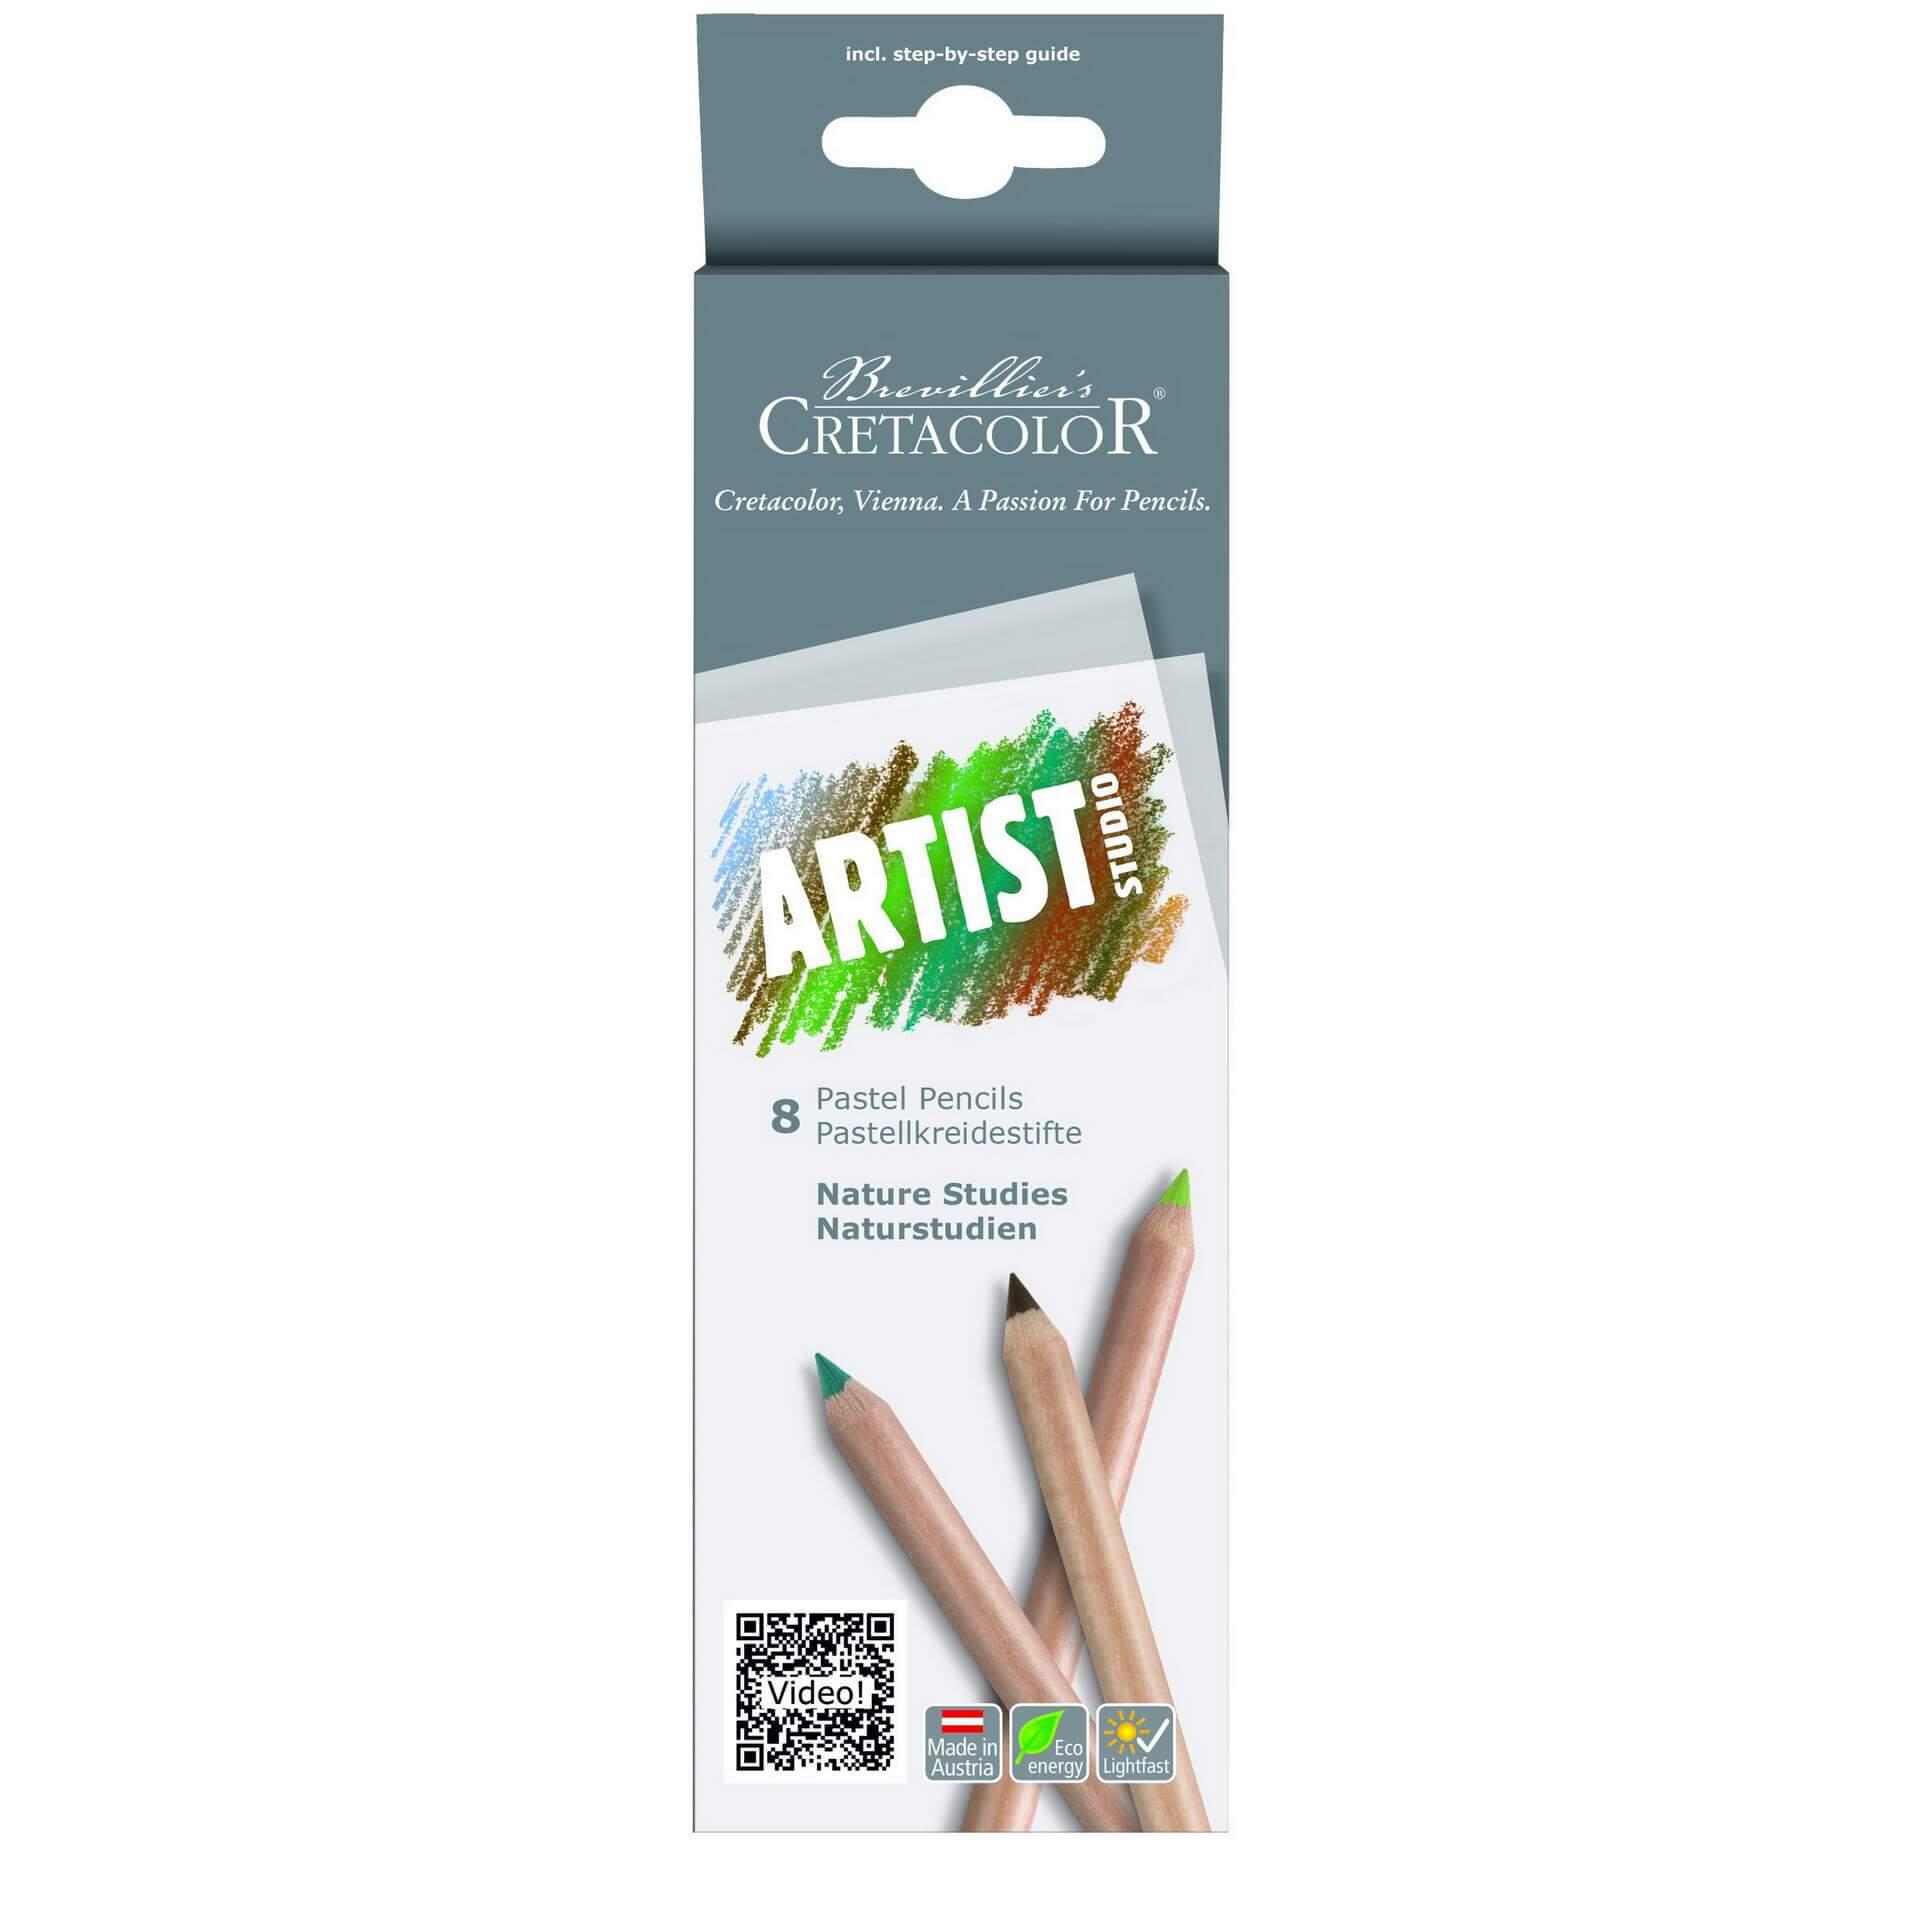 Cretacolor - Artist Studio